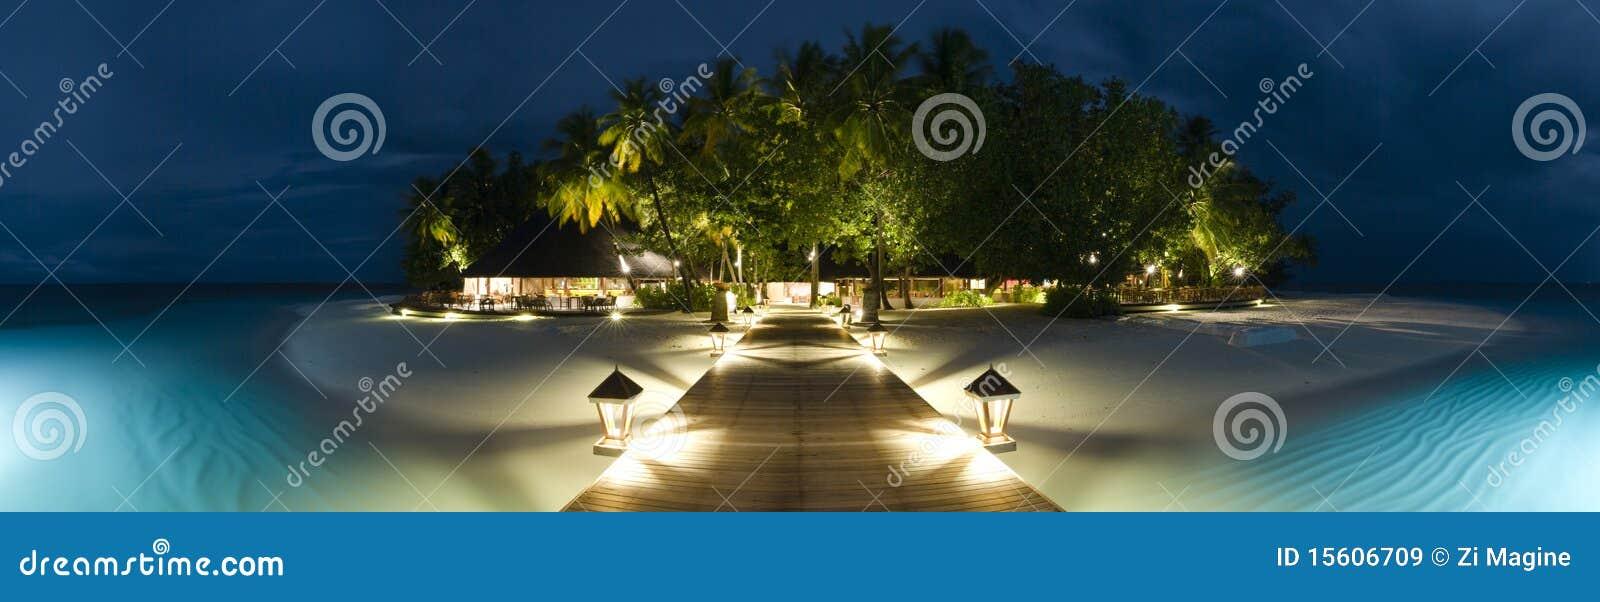 Ihuru Island Maldives Panormaic View By Night Stock Image